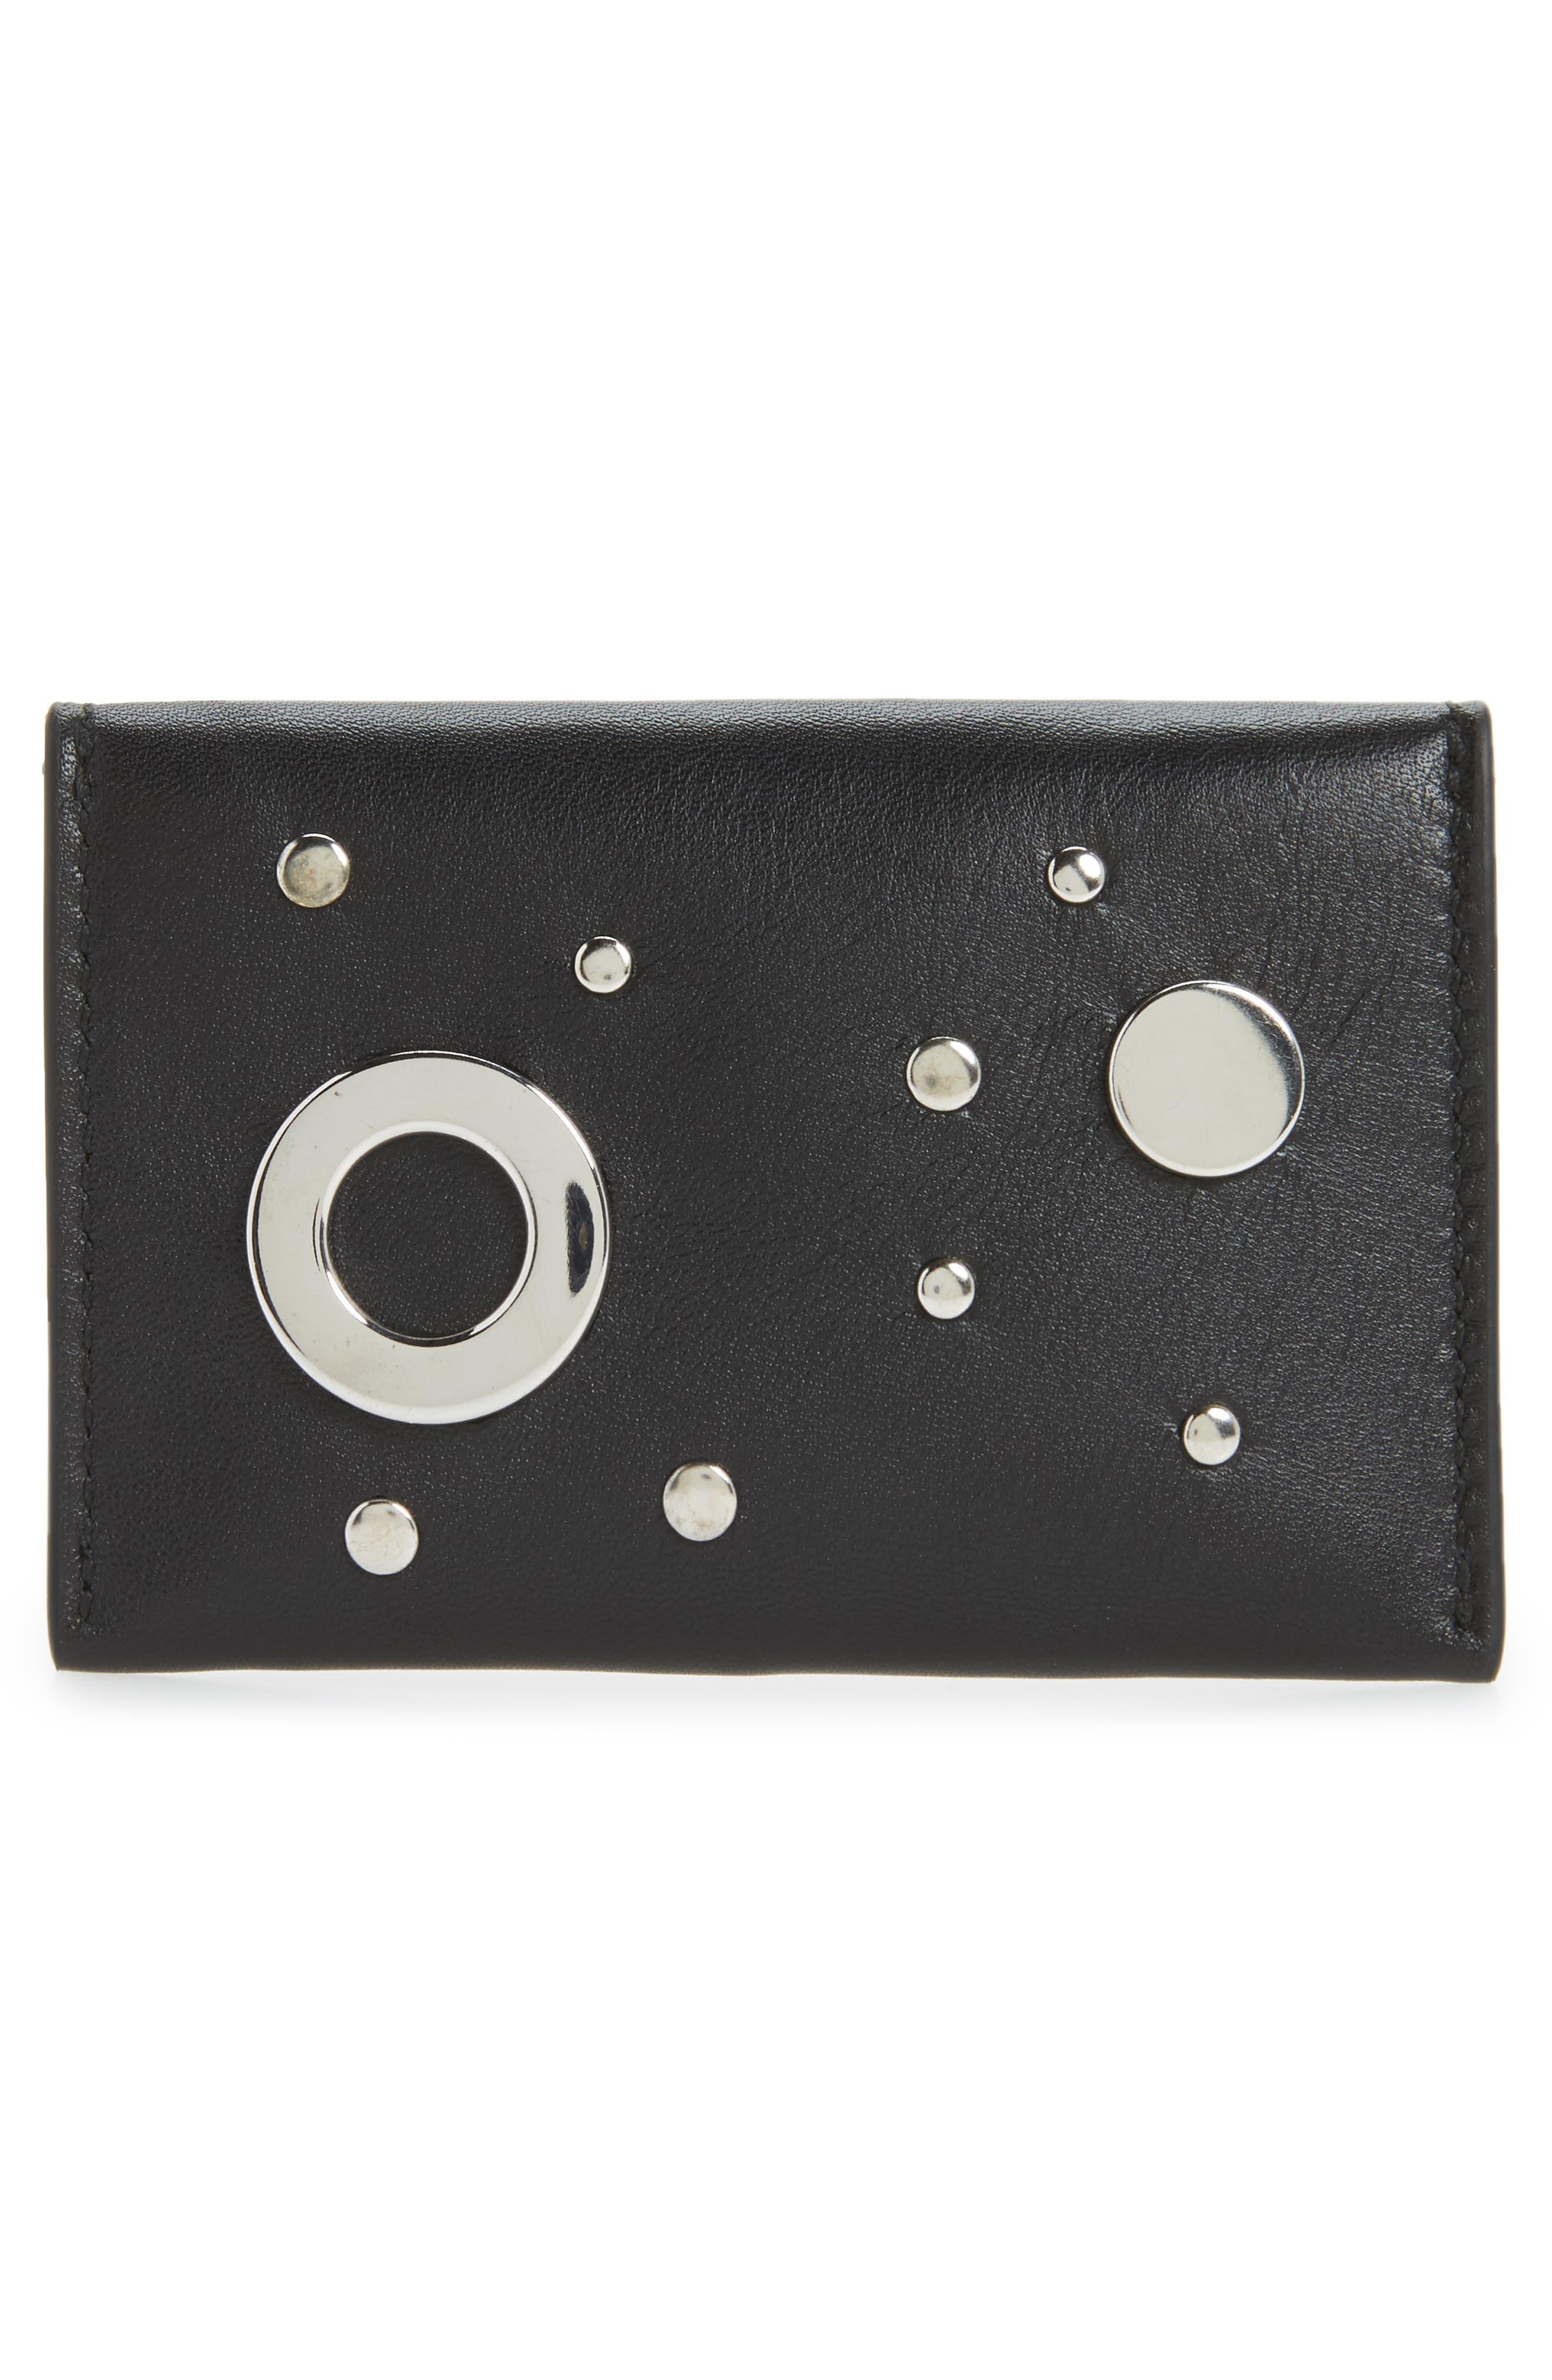 Calfskin Leather Envelope Card Holder,                             Alternate thumbnail 2, color,                             001